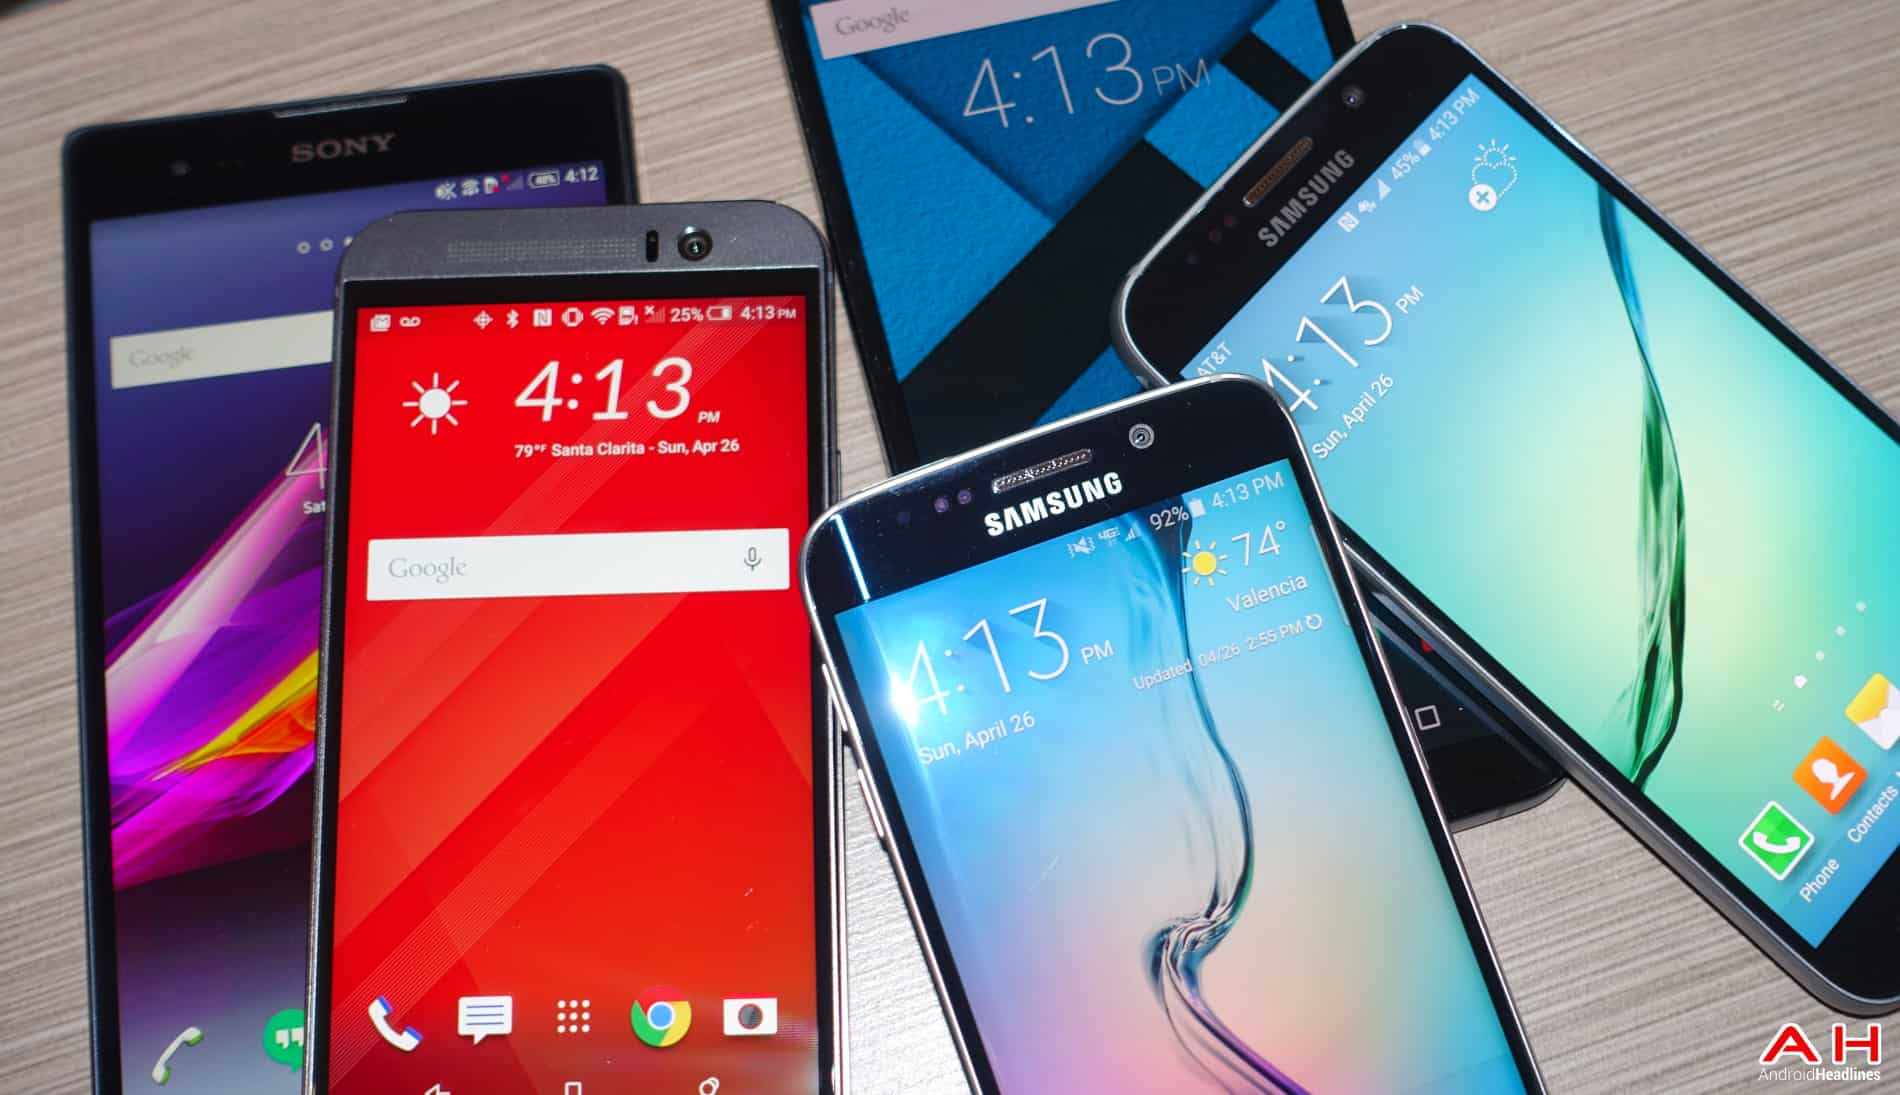 AH Android Samrtphones Nexus Samsung Galaxy S6 HTC One M9 Sony OEM logos-9